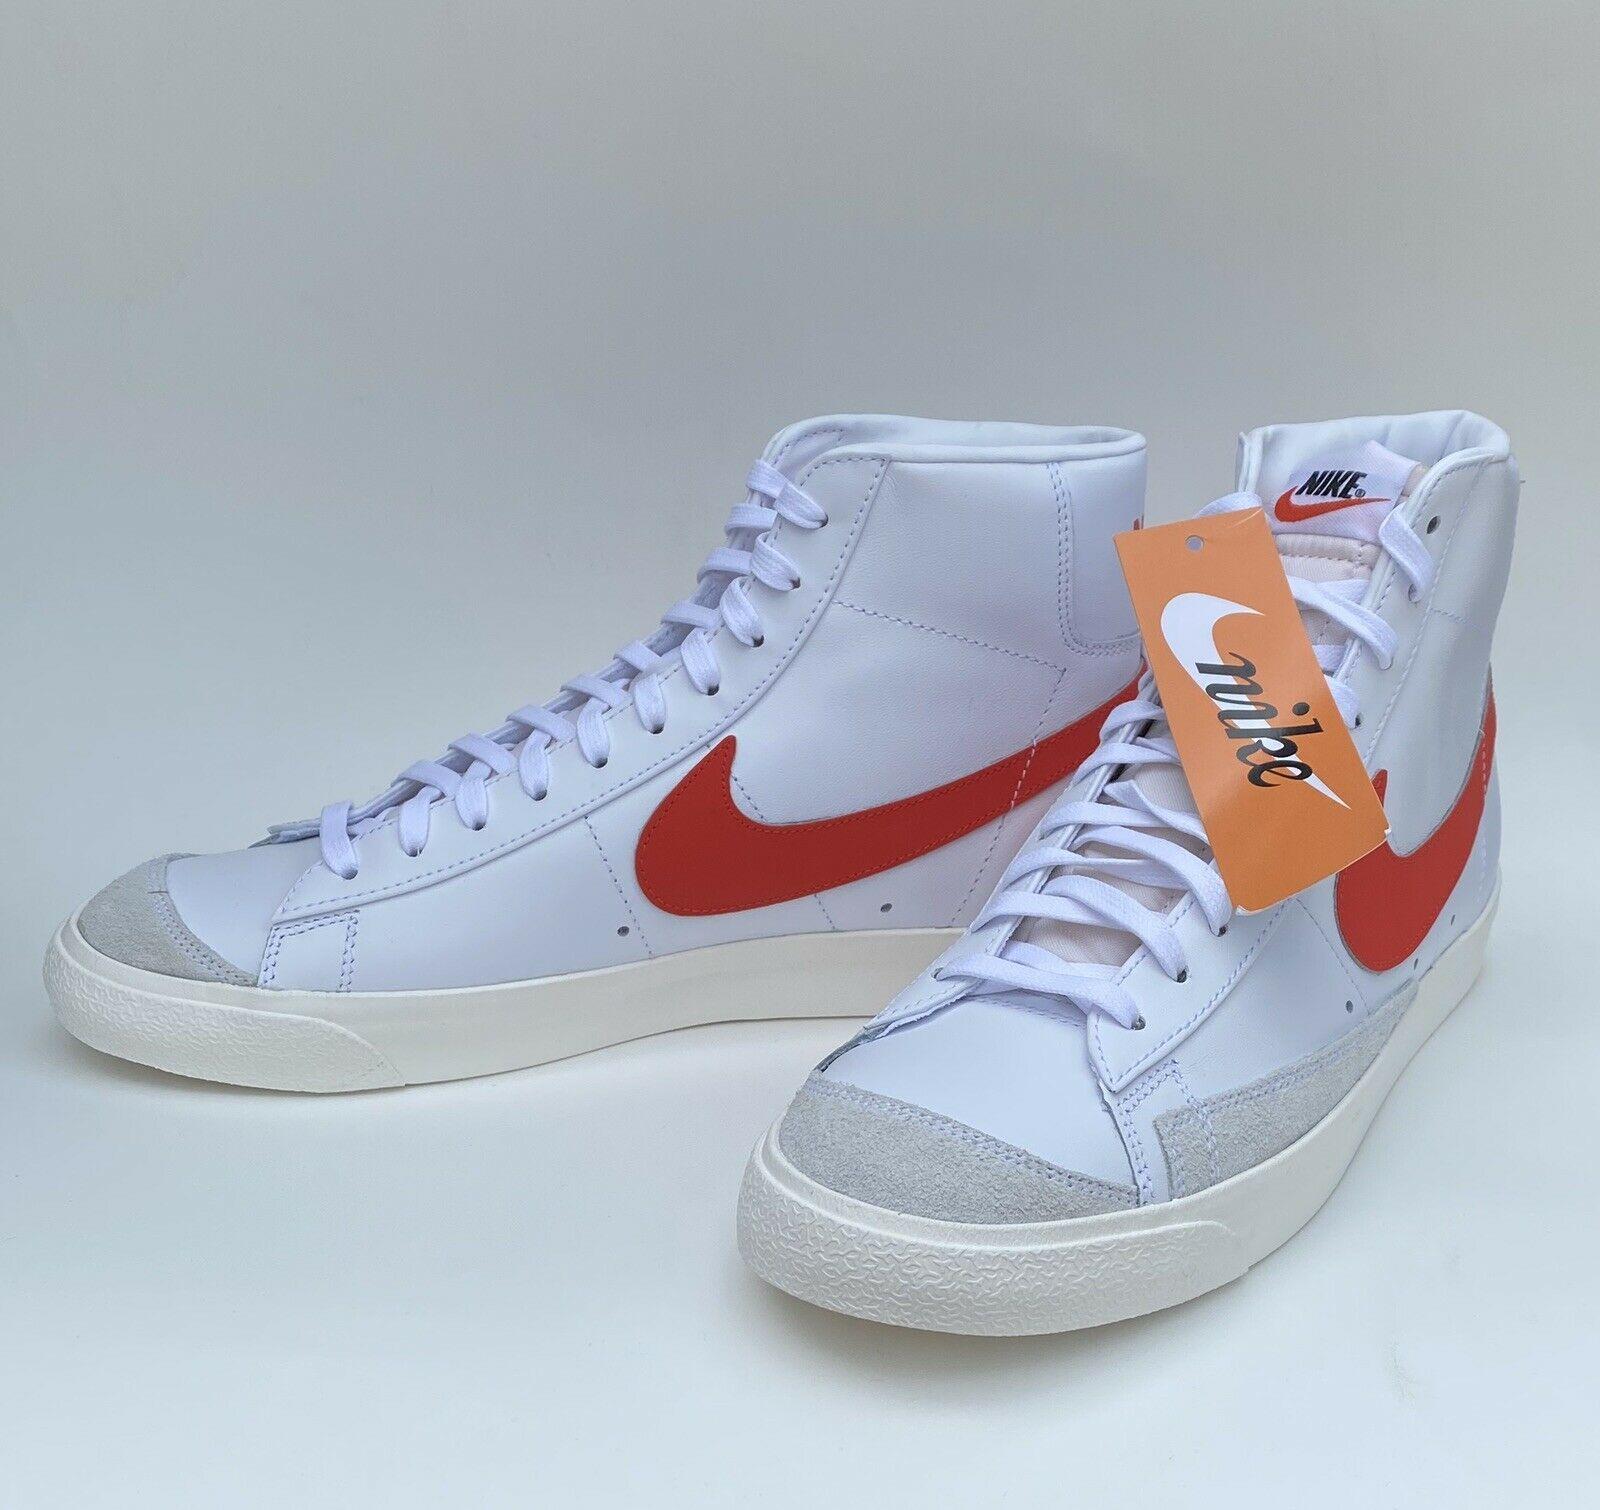 Nike Blazer Mid 77 Habanero Red